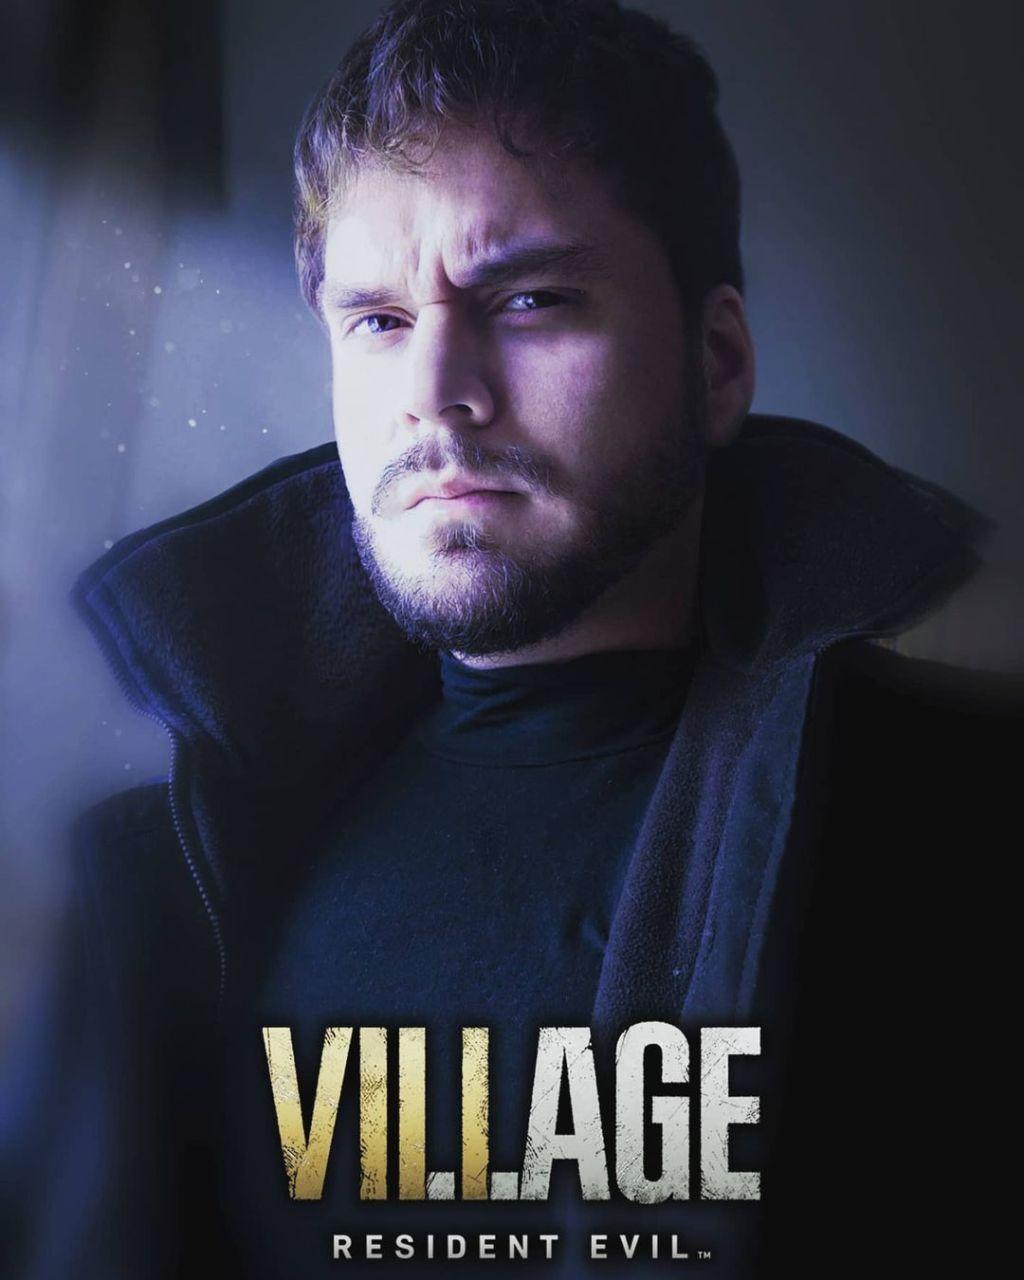 Chris Redfield Cosplay - Resident Evil Village - 01